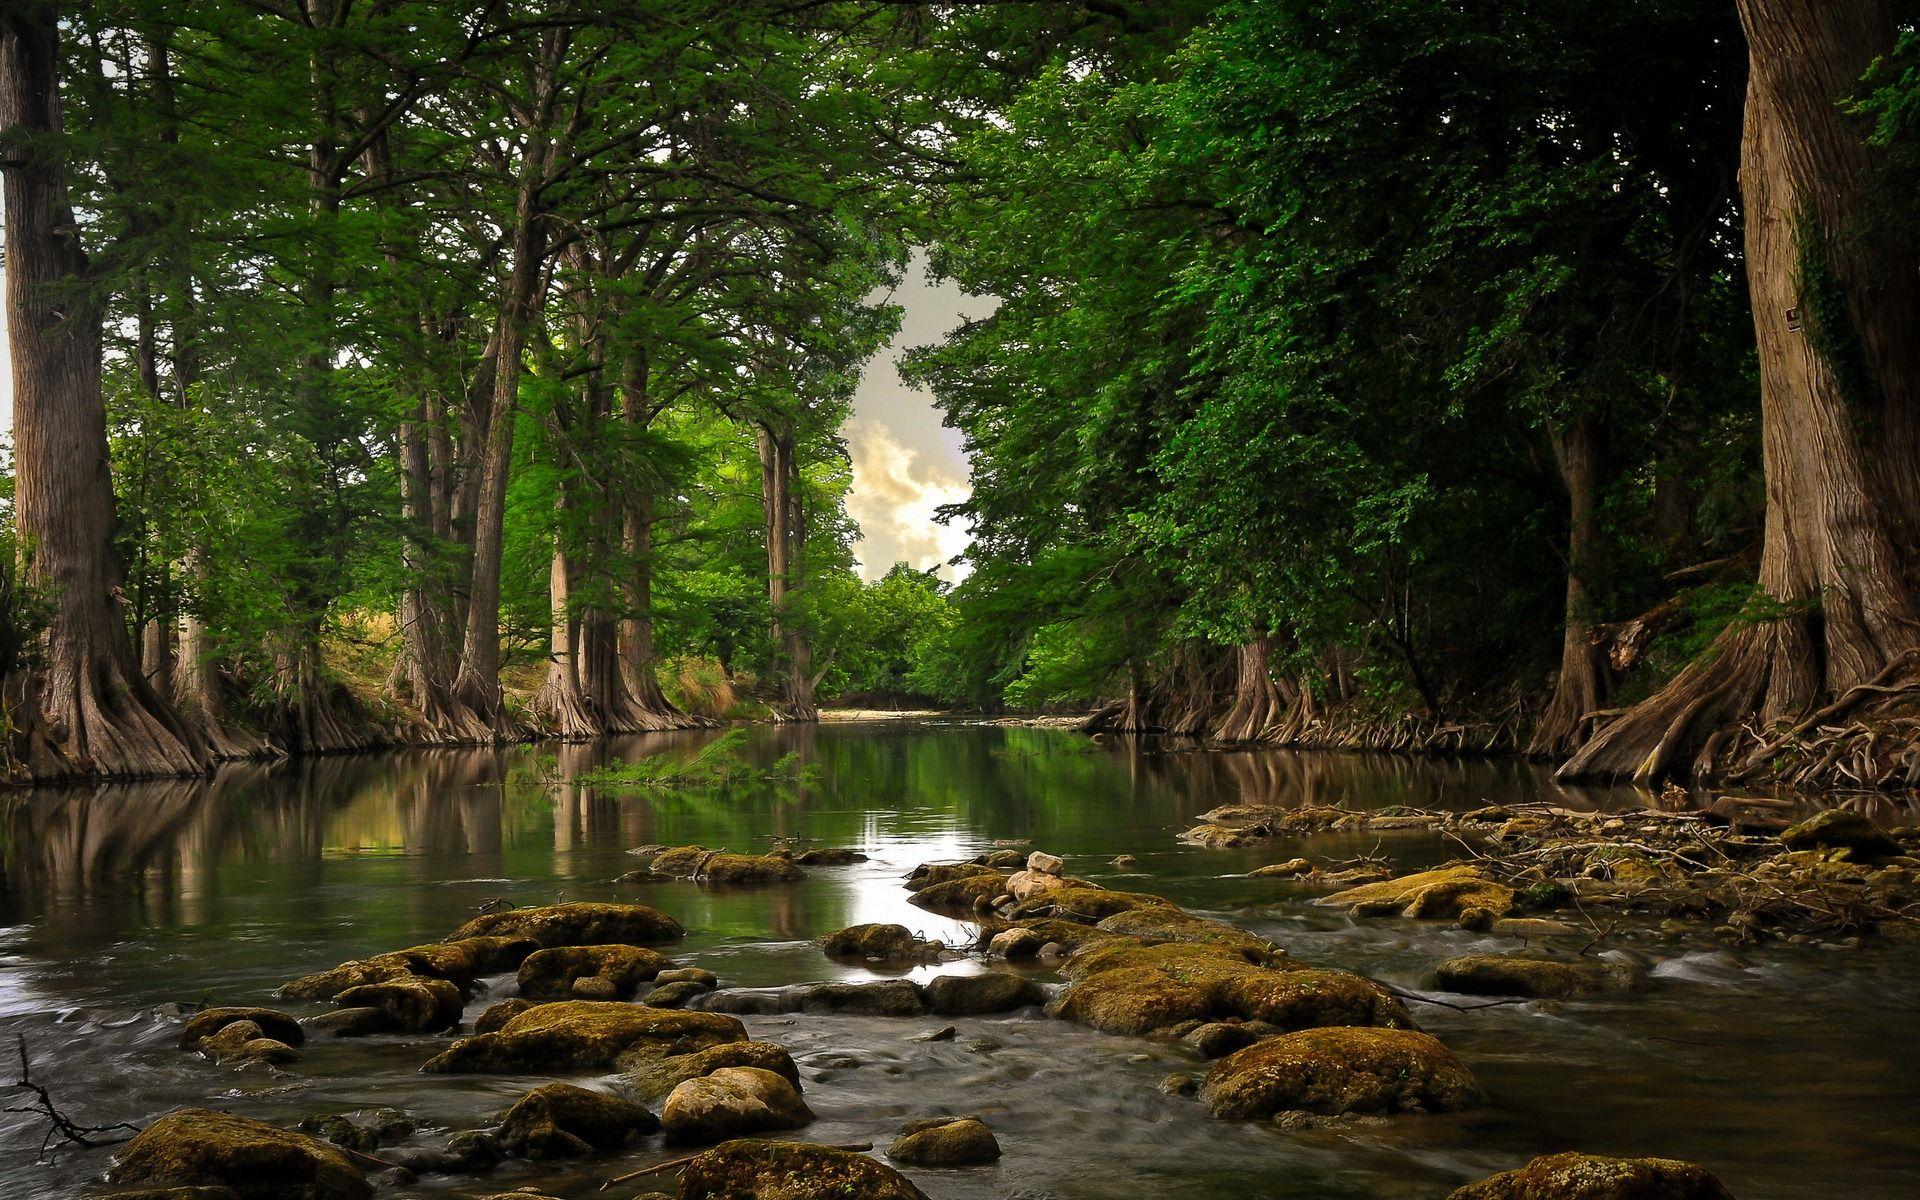 Resultado De Imagen Para Imagen De La Naturaleza En Hd Fondos De Escritorio Descargar Fondos De Pantalla Para Pc Fondos De Pantalla Bosques